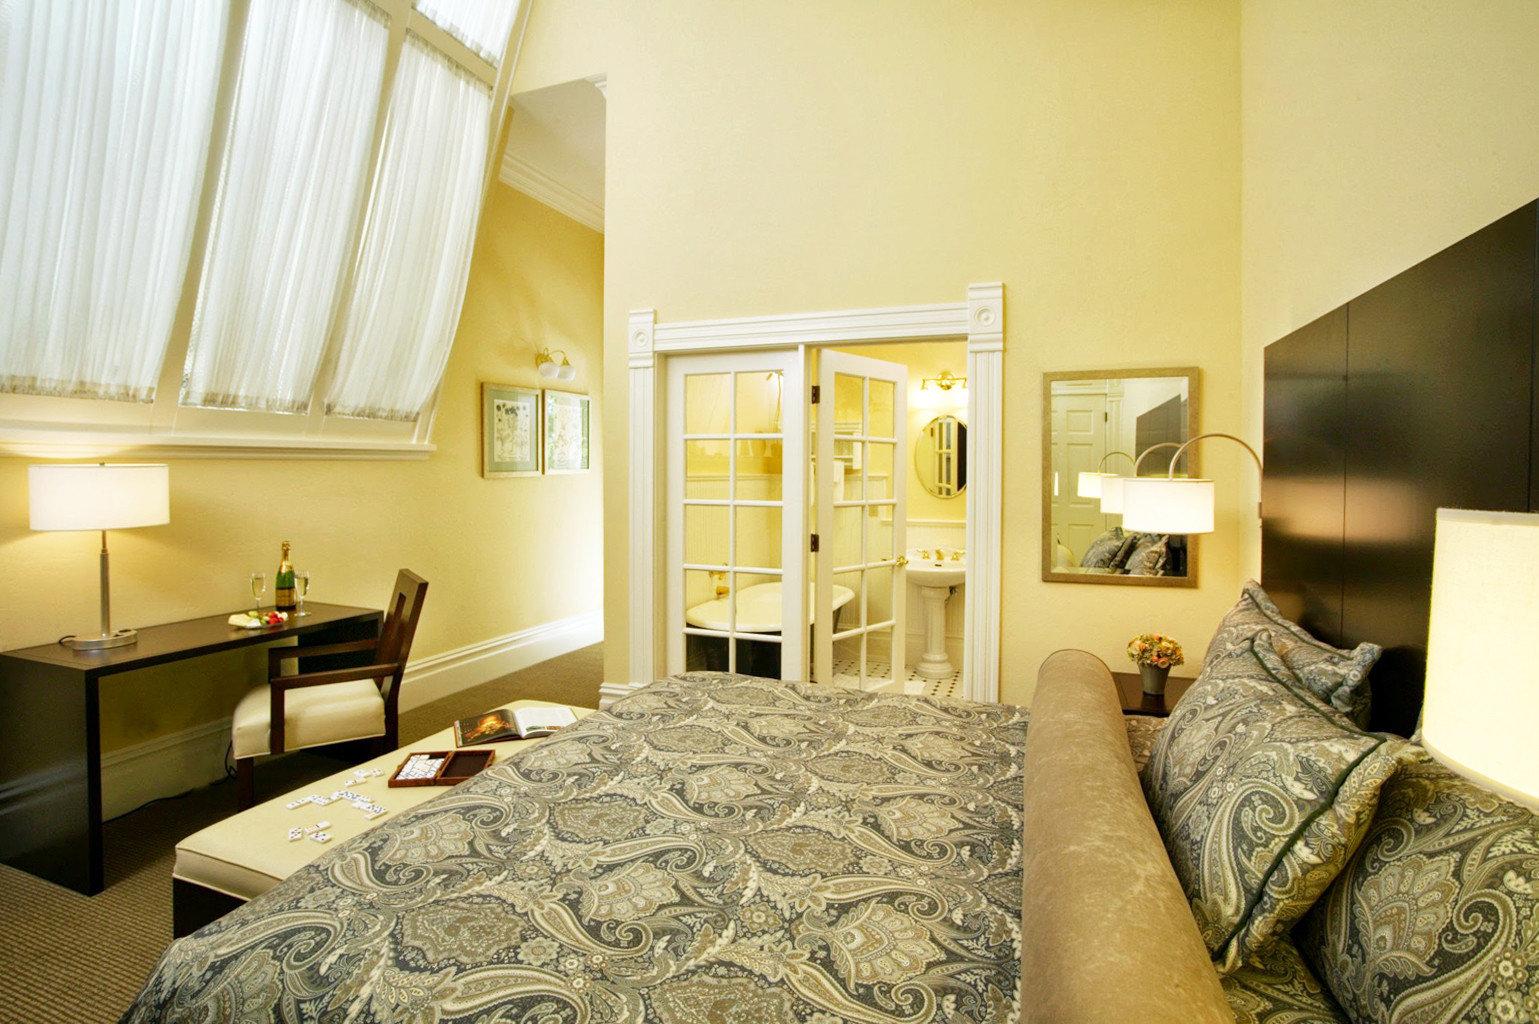 Bedroom Boutique Inn sofa property home Suite cottage living room